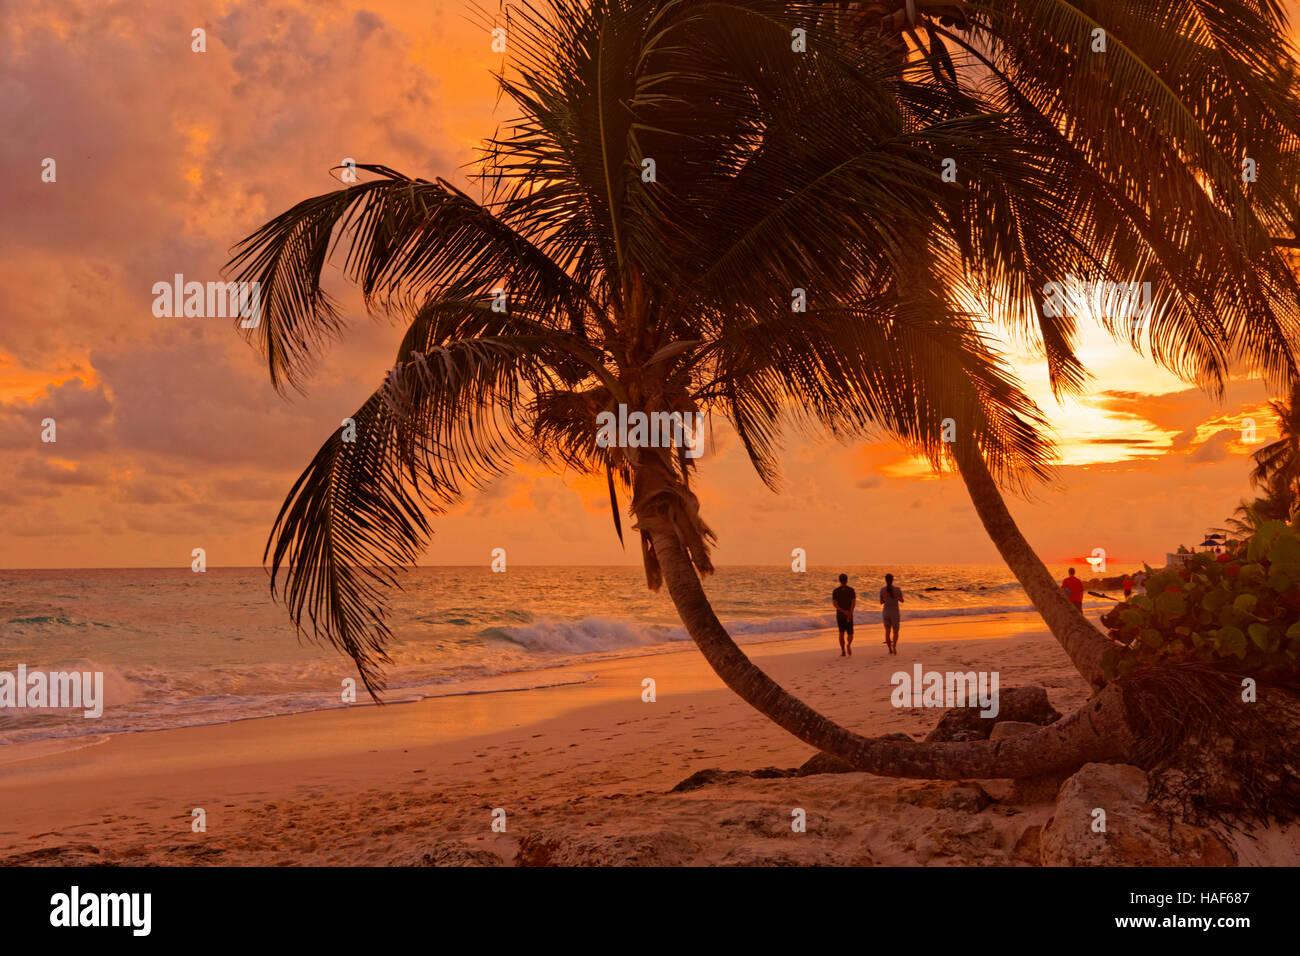 Sonnenuntergang bei Dover Beach, St. Lawrence Gap, South Coast, Barbados, Karibik. Stockbild